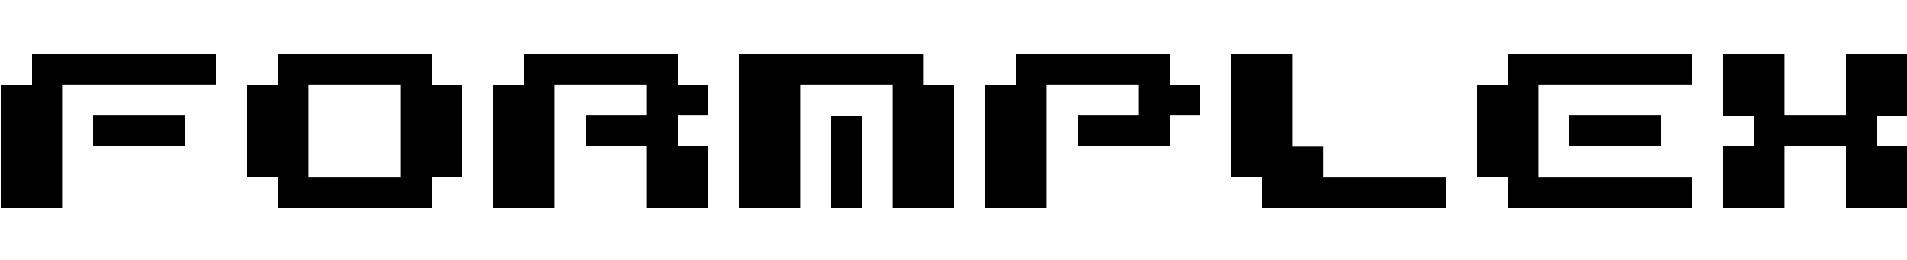 formplex